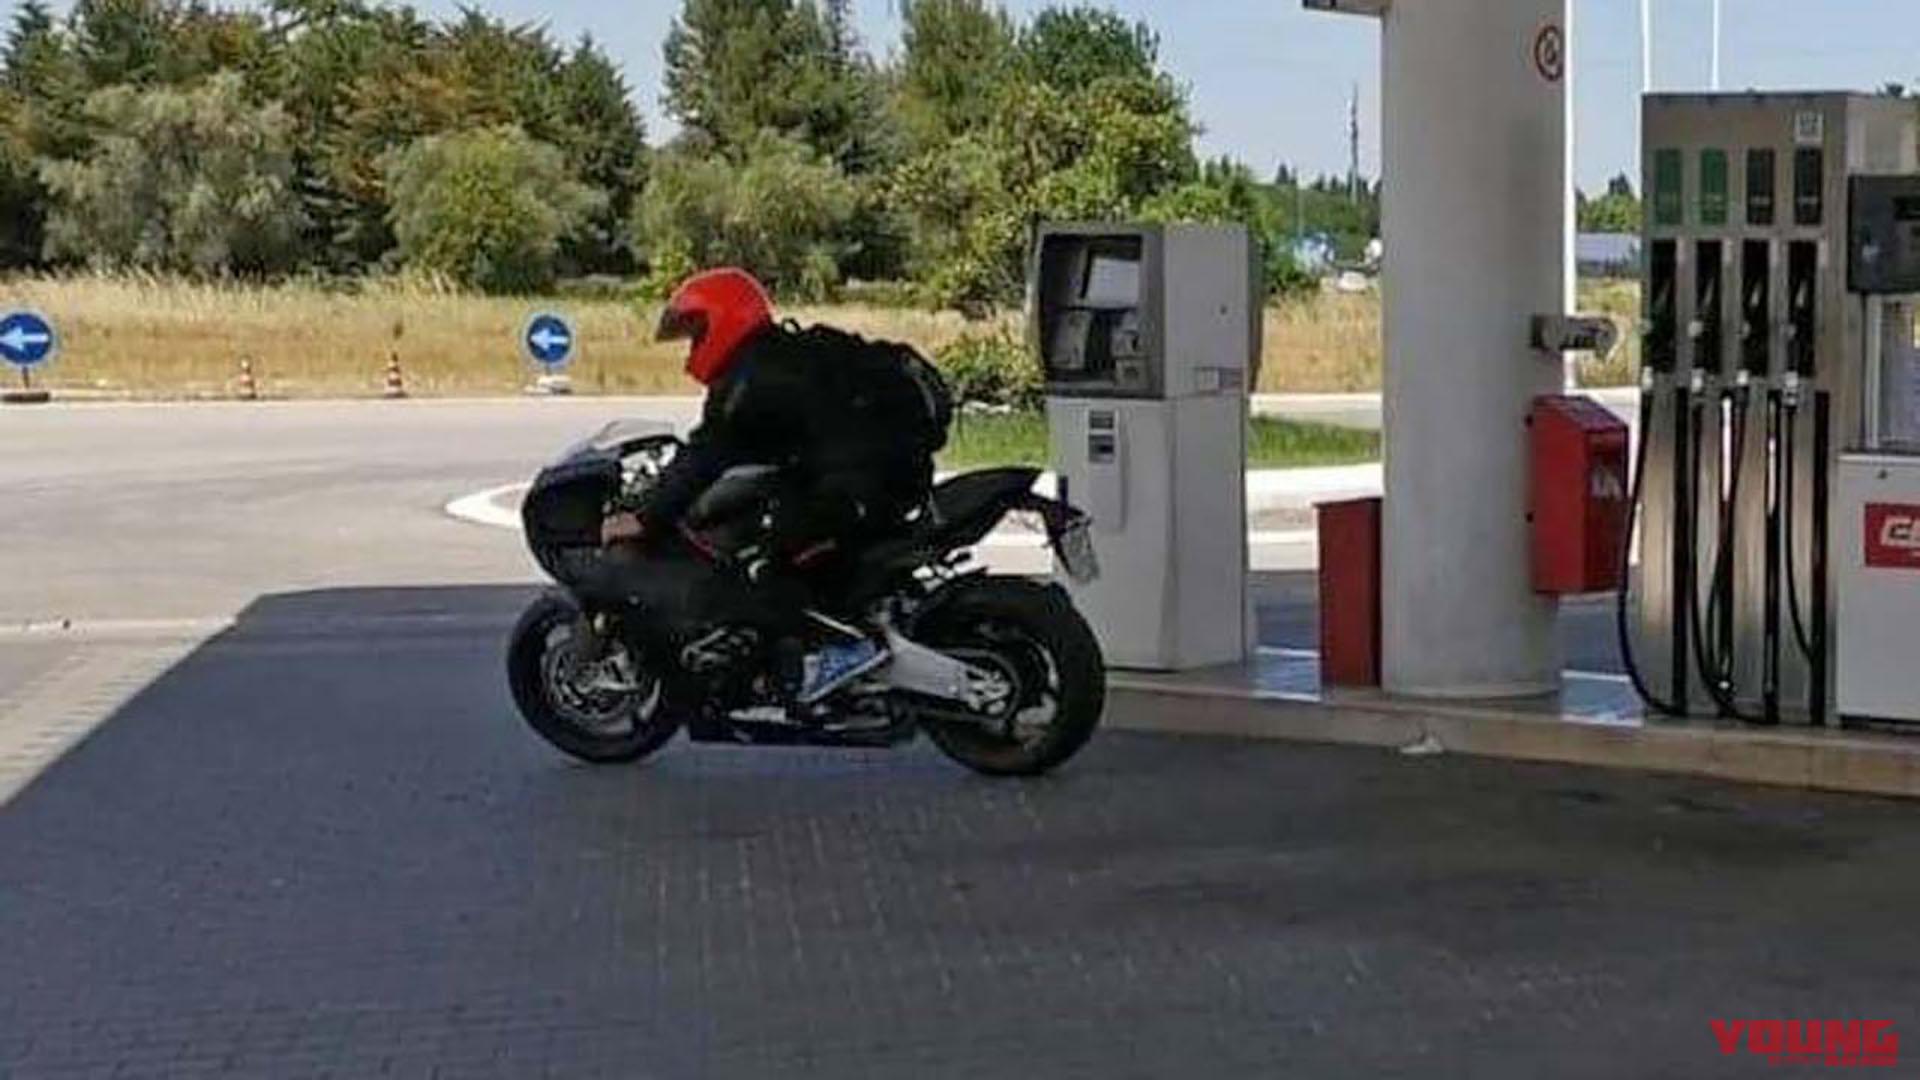 nova-bimota-kb4-foi-flagrada-durante-abastecimento-na-italia-moto-adventure